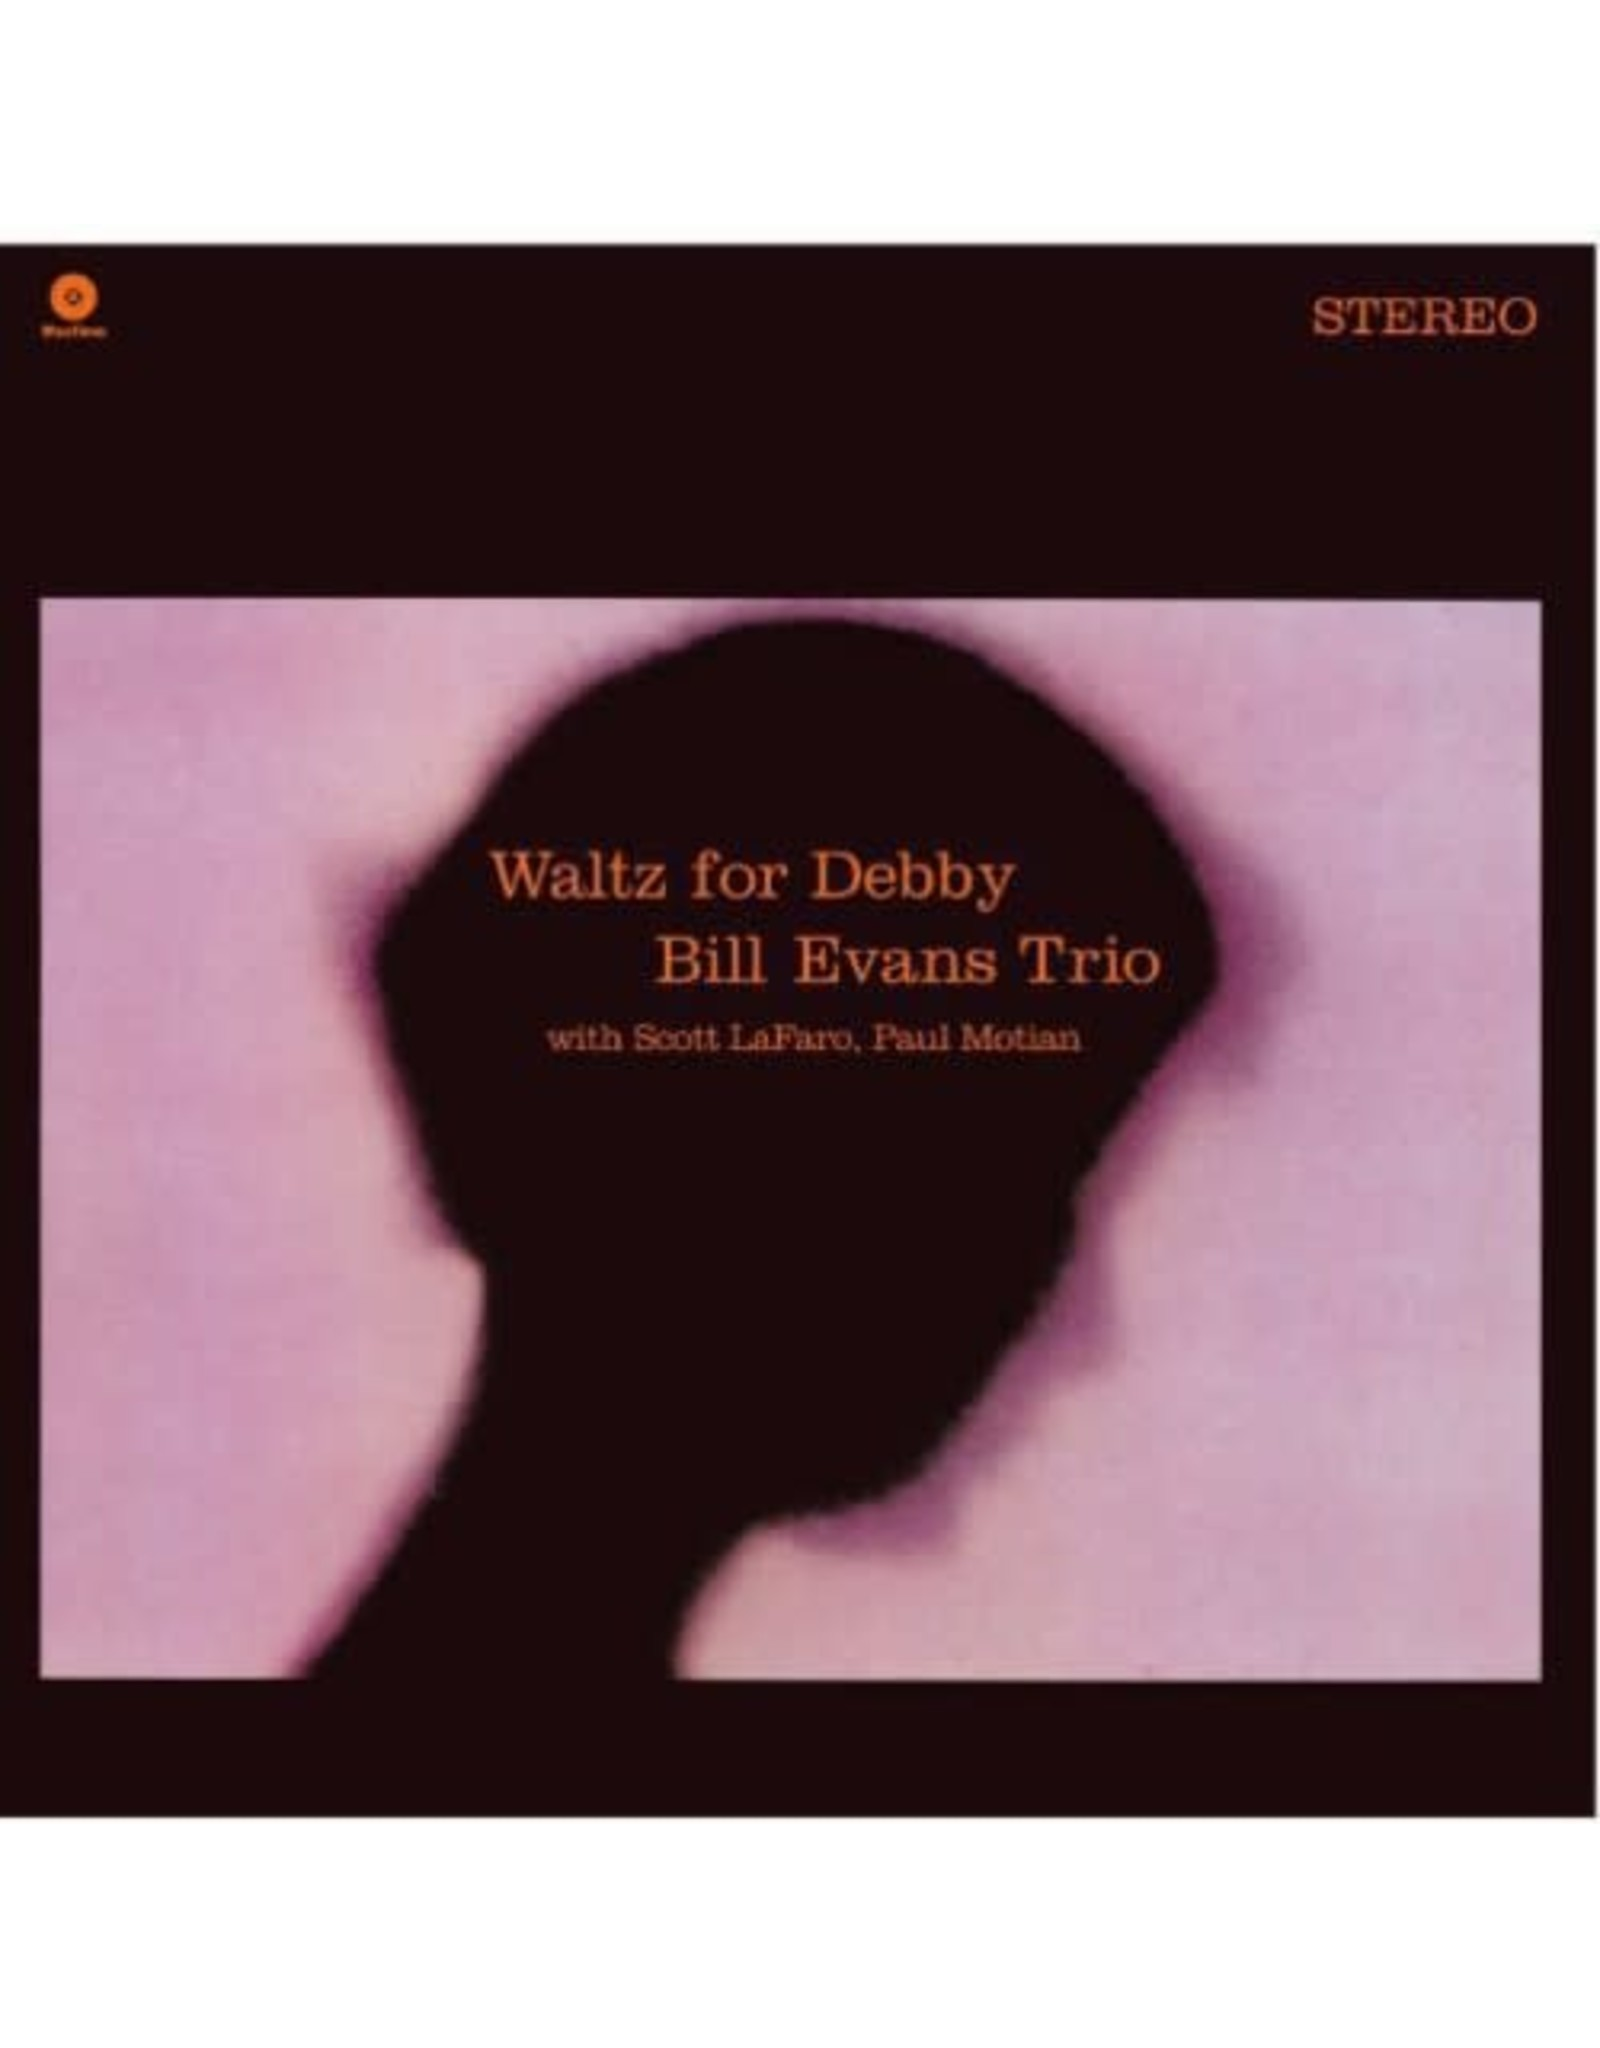 New Vinyl Bill Evans - Waltz For Debby LP